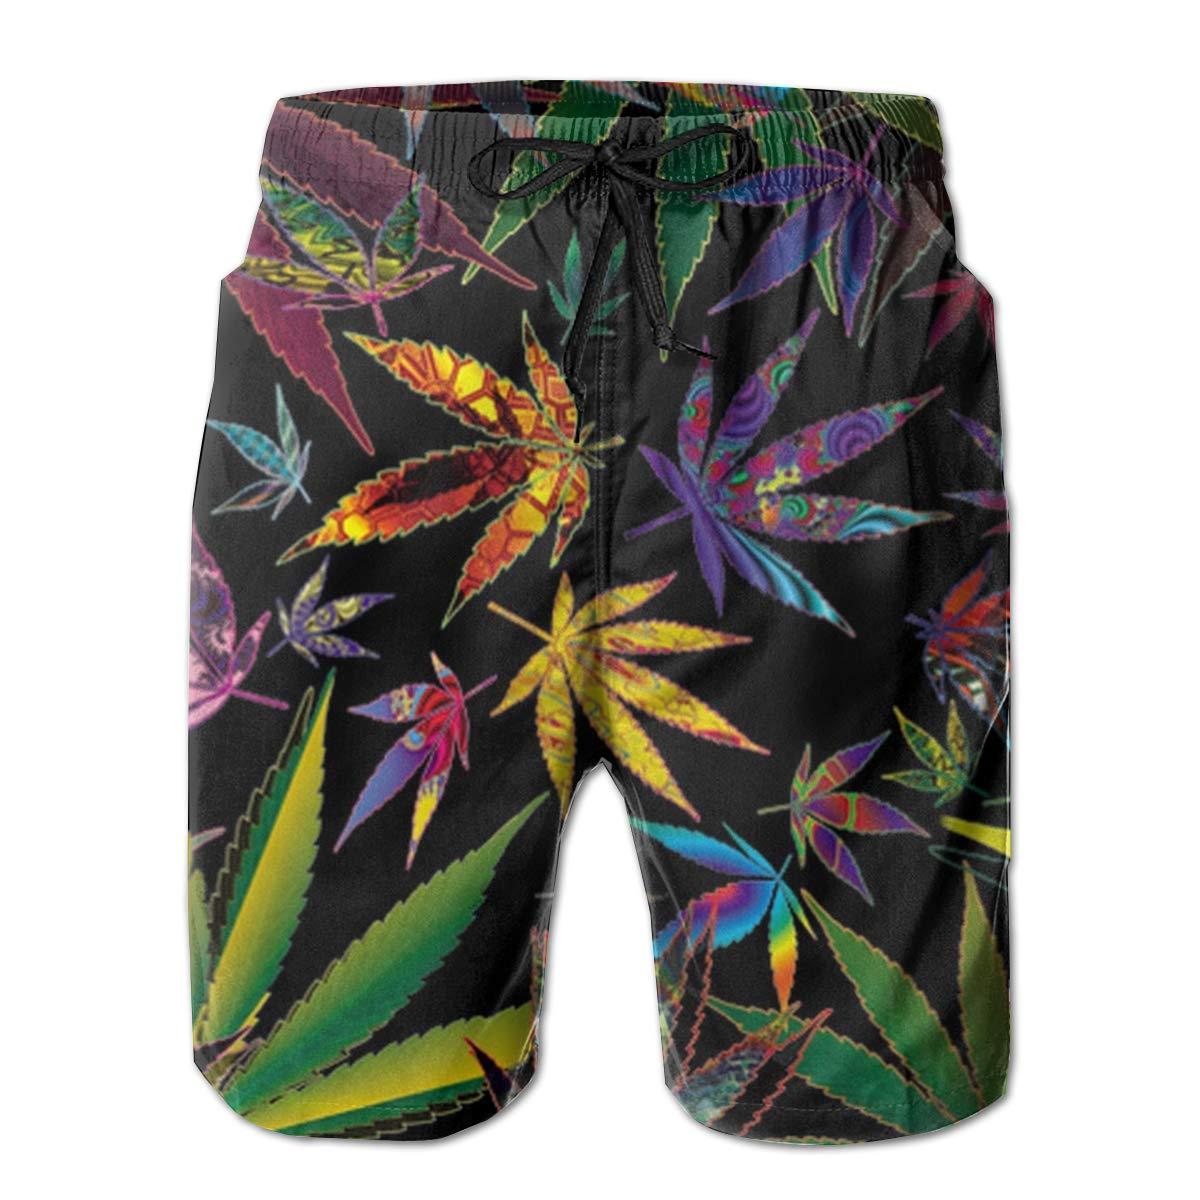 Mens Swim Trunks Summer Trippy Multi Marijuana Leaf Weed 3D Print Graphic Casual Athletic Swimming Short